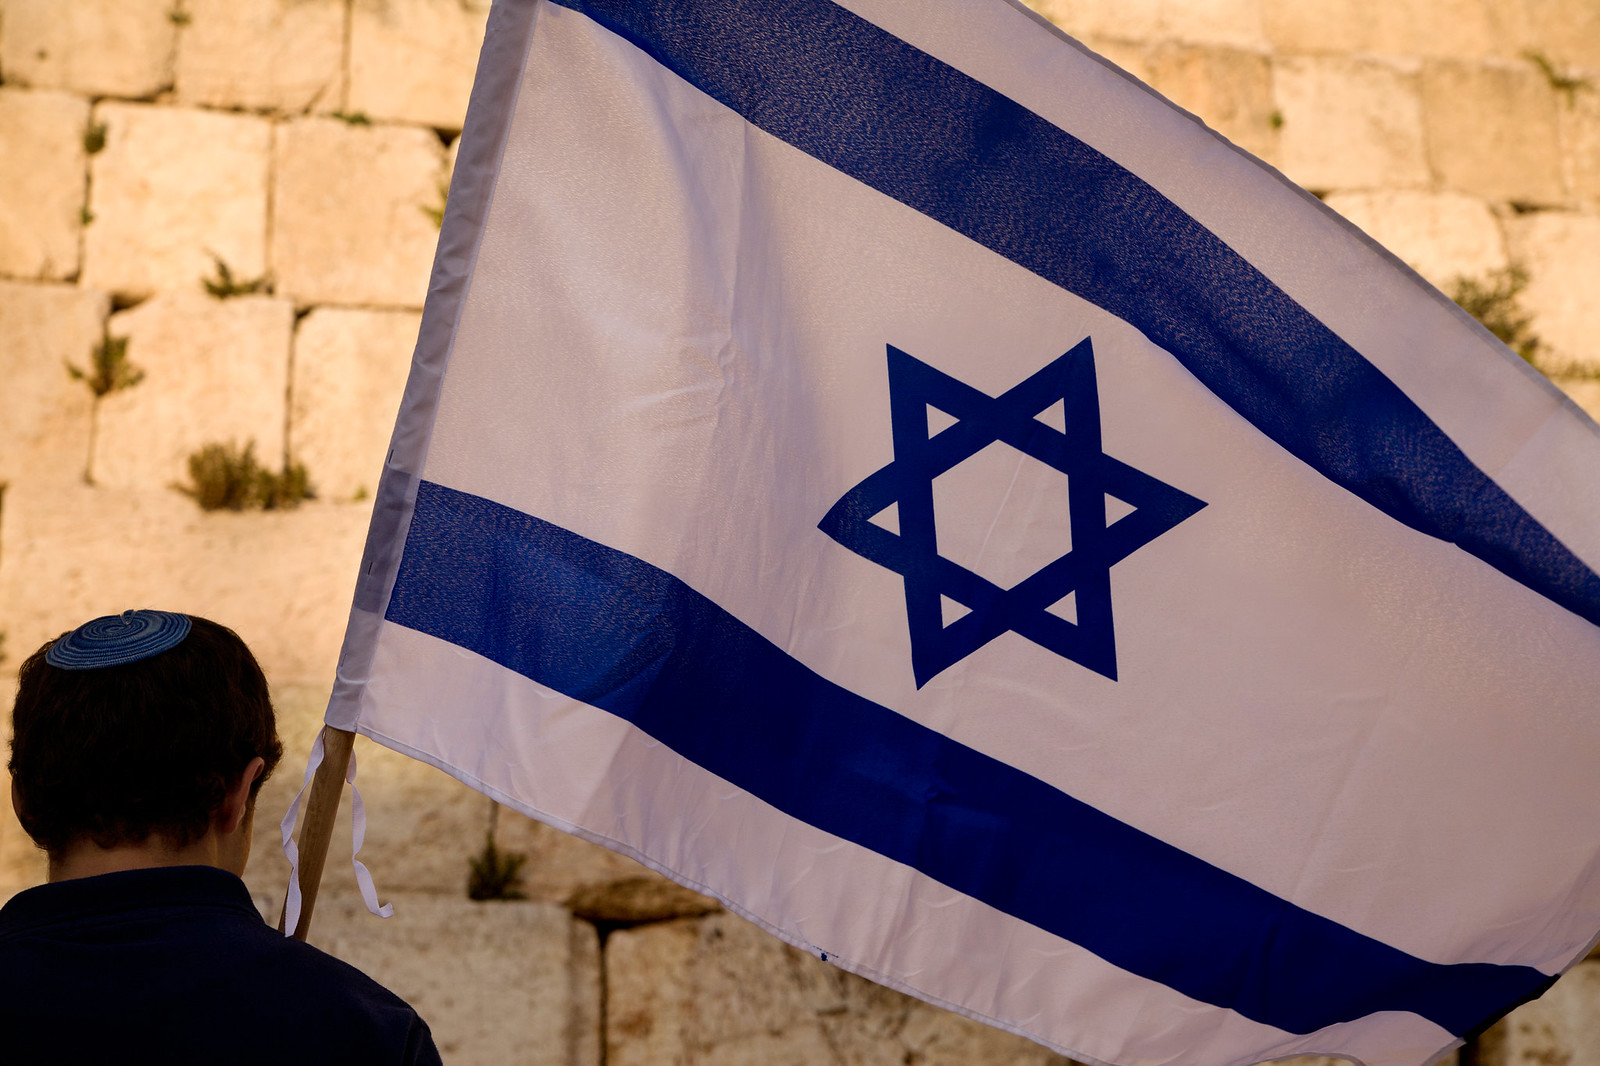 Jerusalem_Western Wall_9_Noam Chen_IMOT